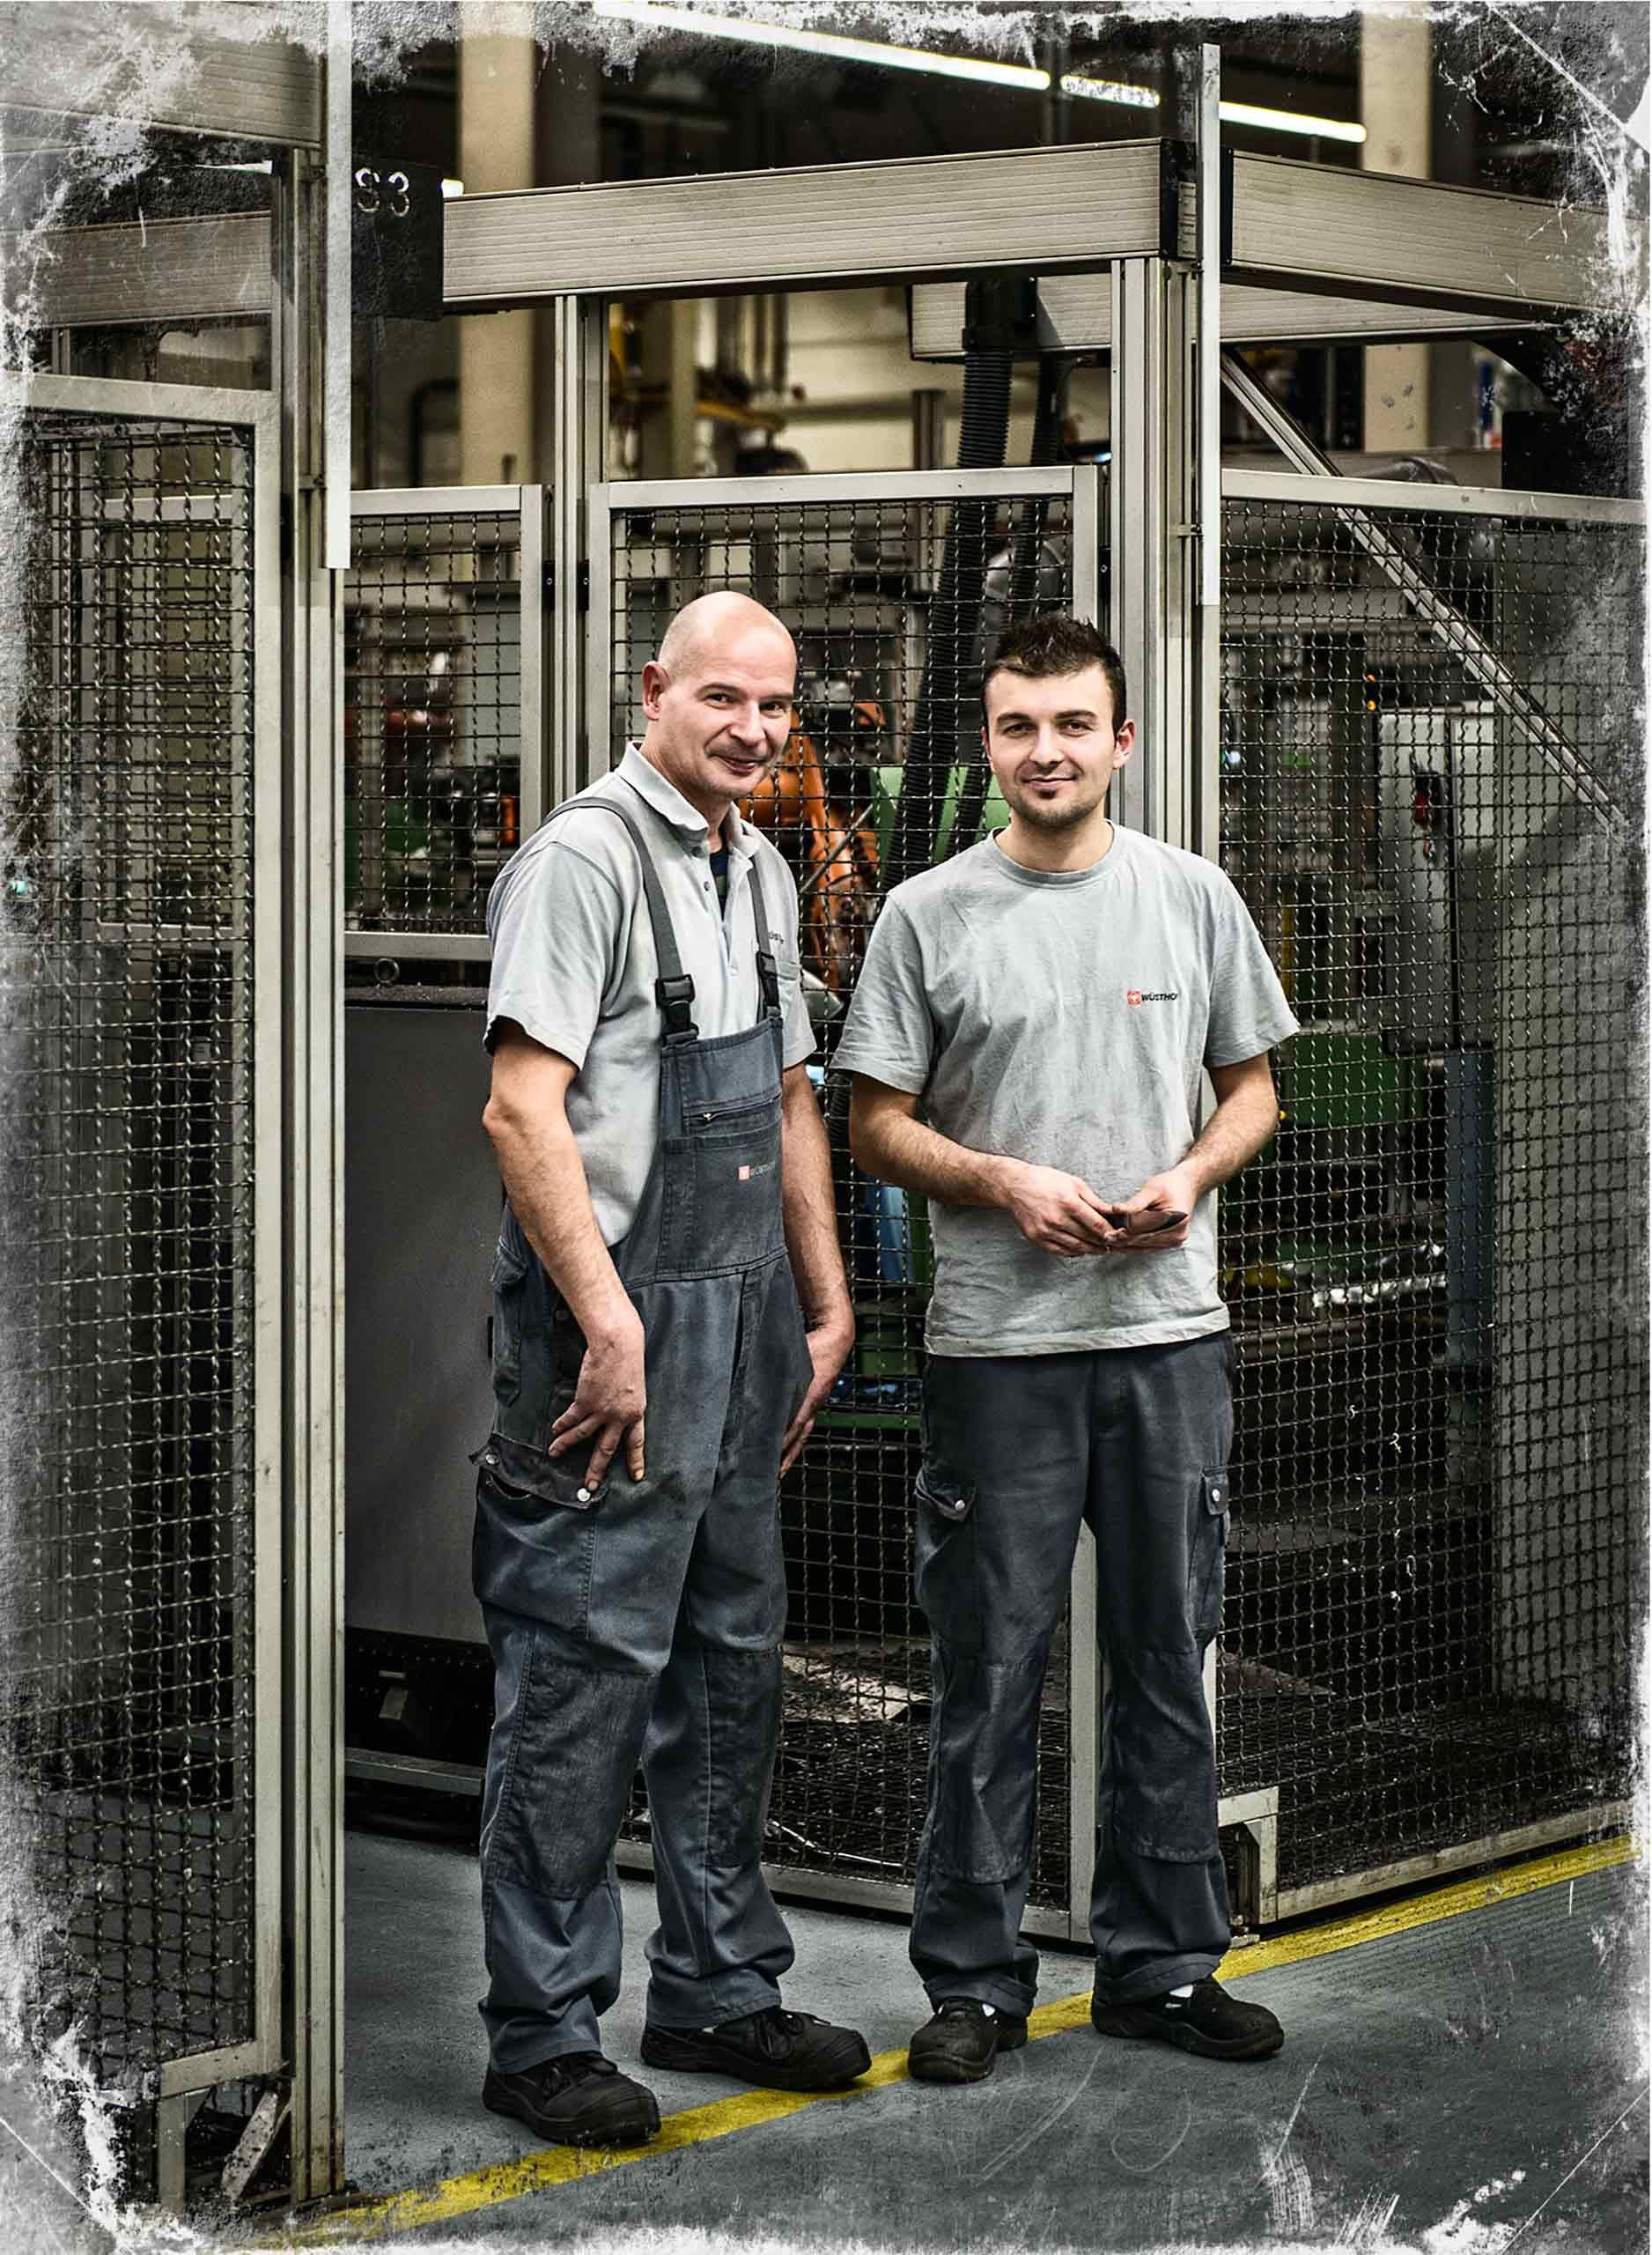 workers-wustof-factory-solingen-germany-by-HenrikOlundPhotography.jpg